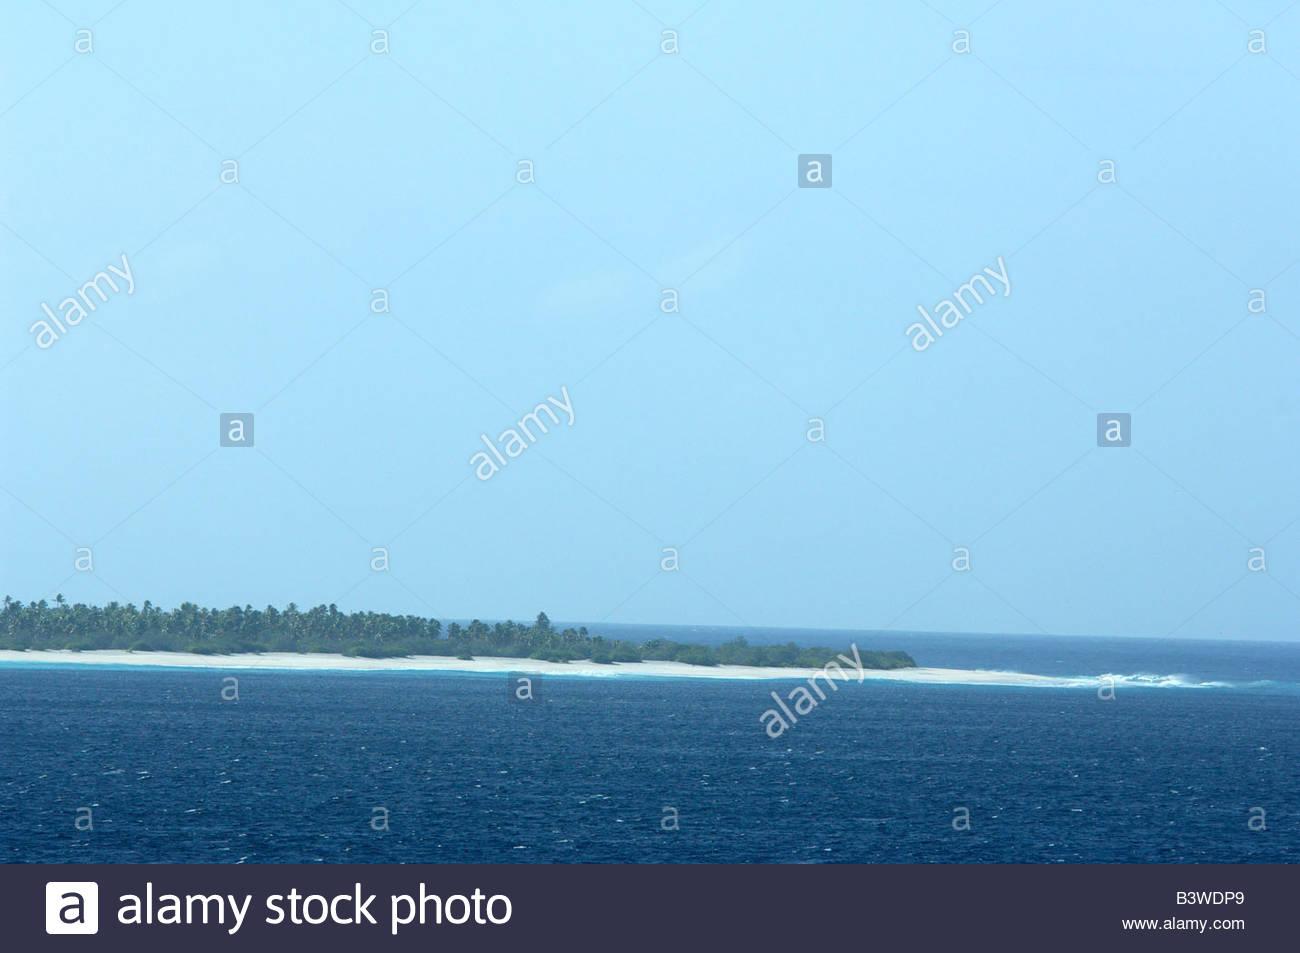 South Pacific, nation of Tuvalu, Kiribati, Christmas Island. Largest ...